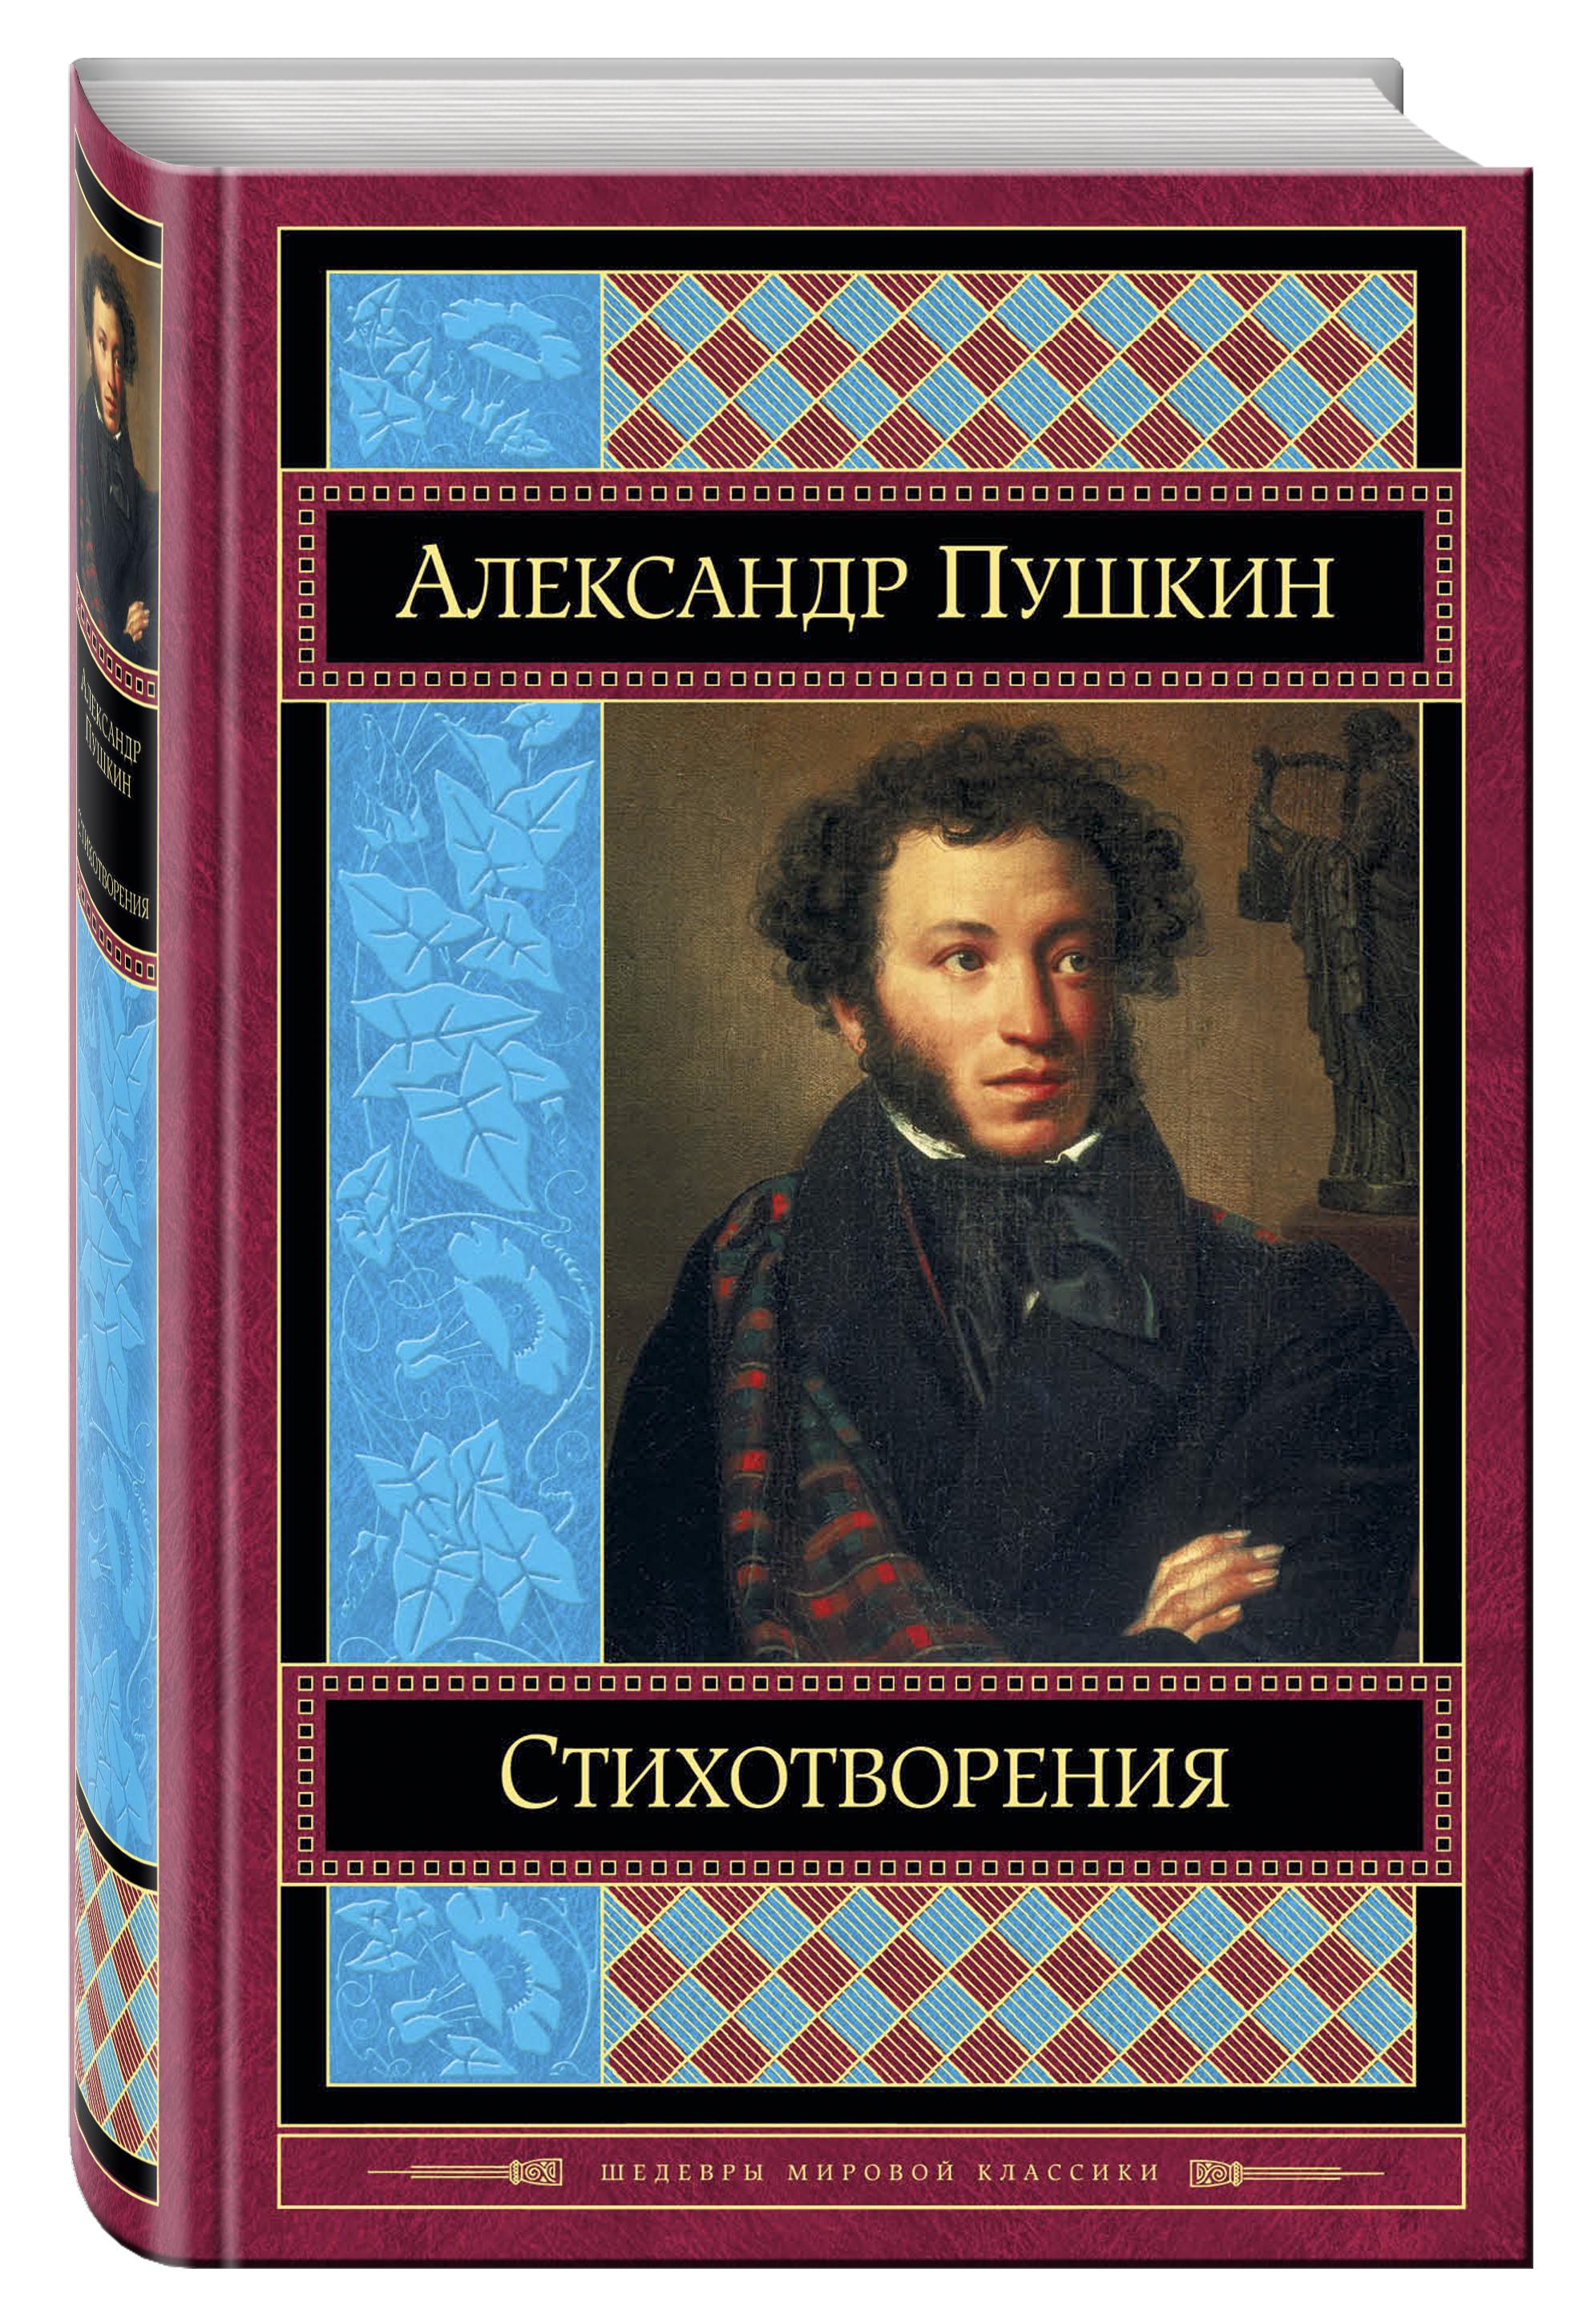 все цены на Александр Пушкин Стихотворения онлайн